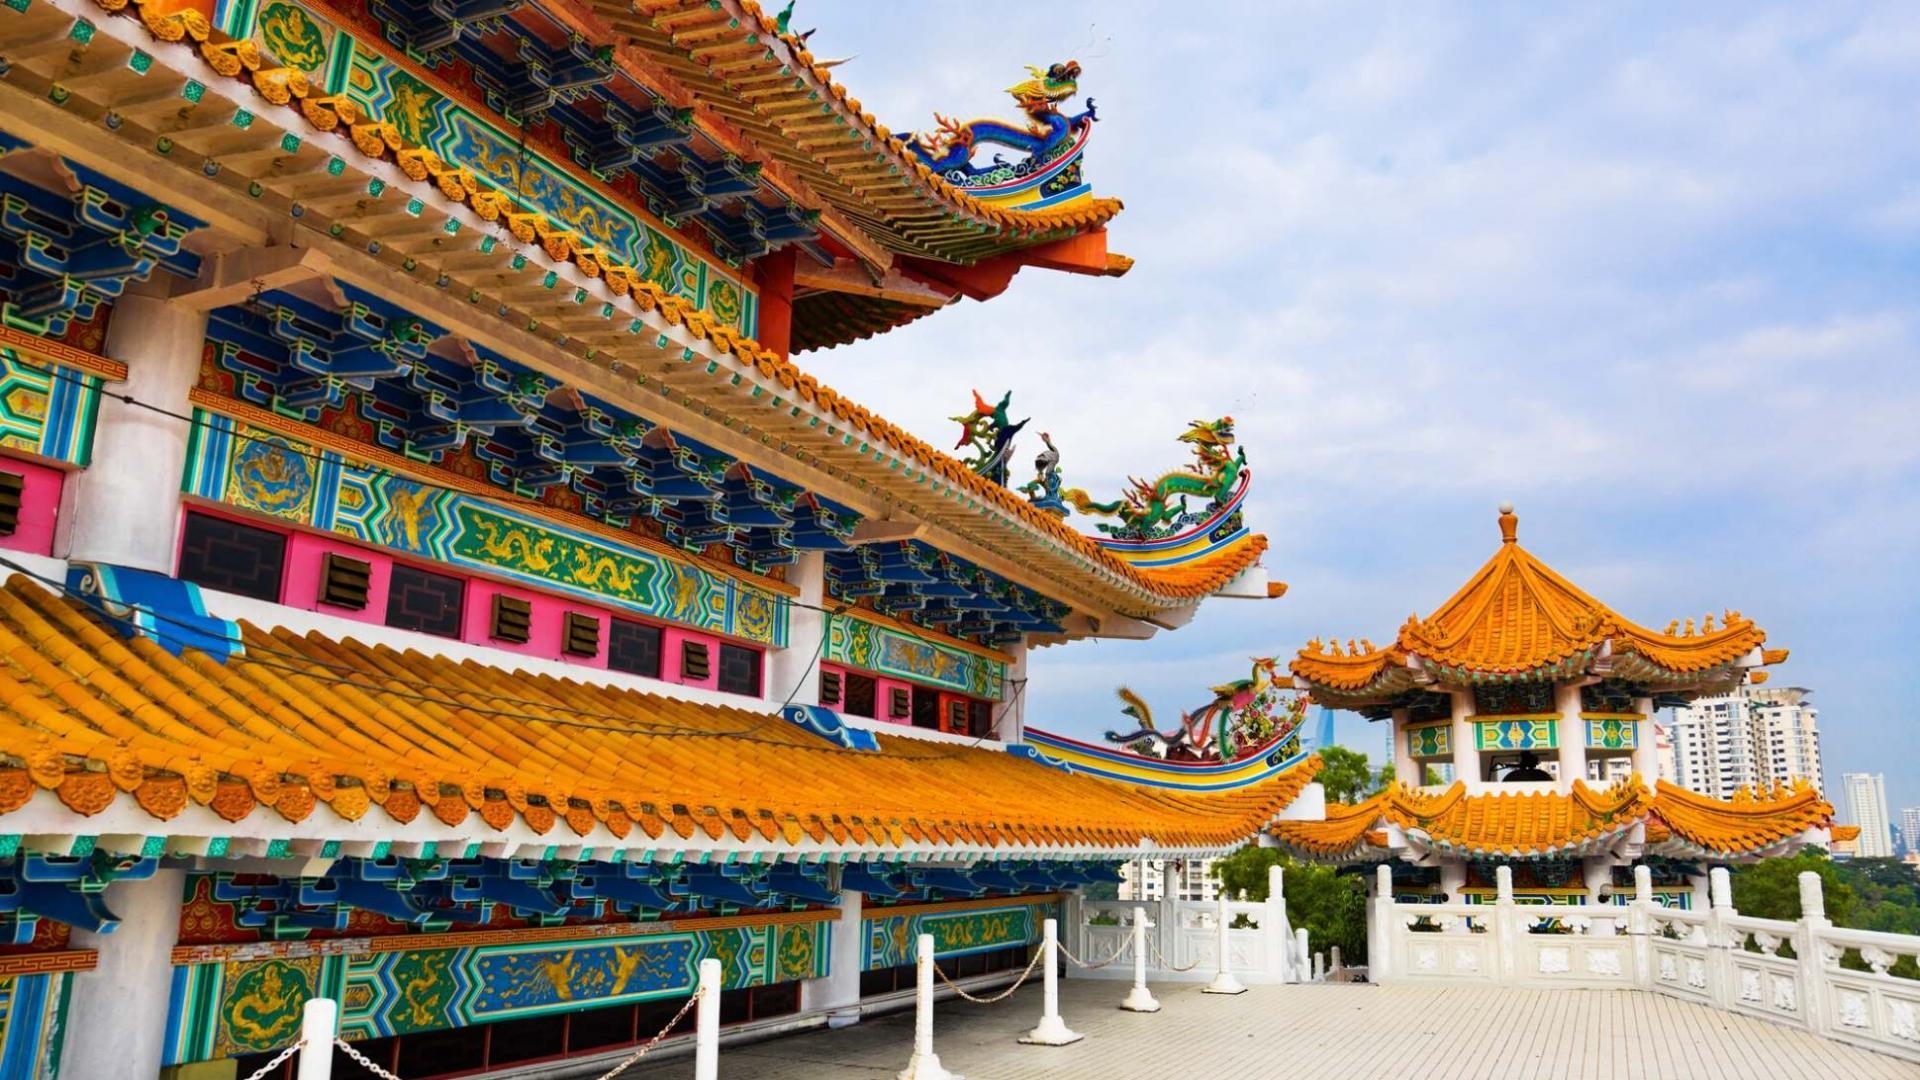 Margaspalvės šventyklos Kuala Lumpure